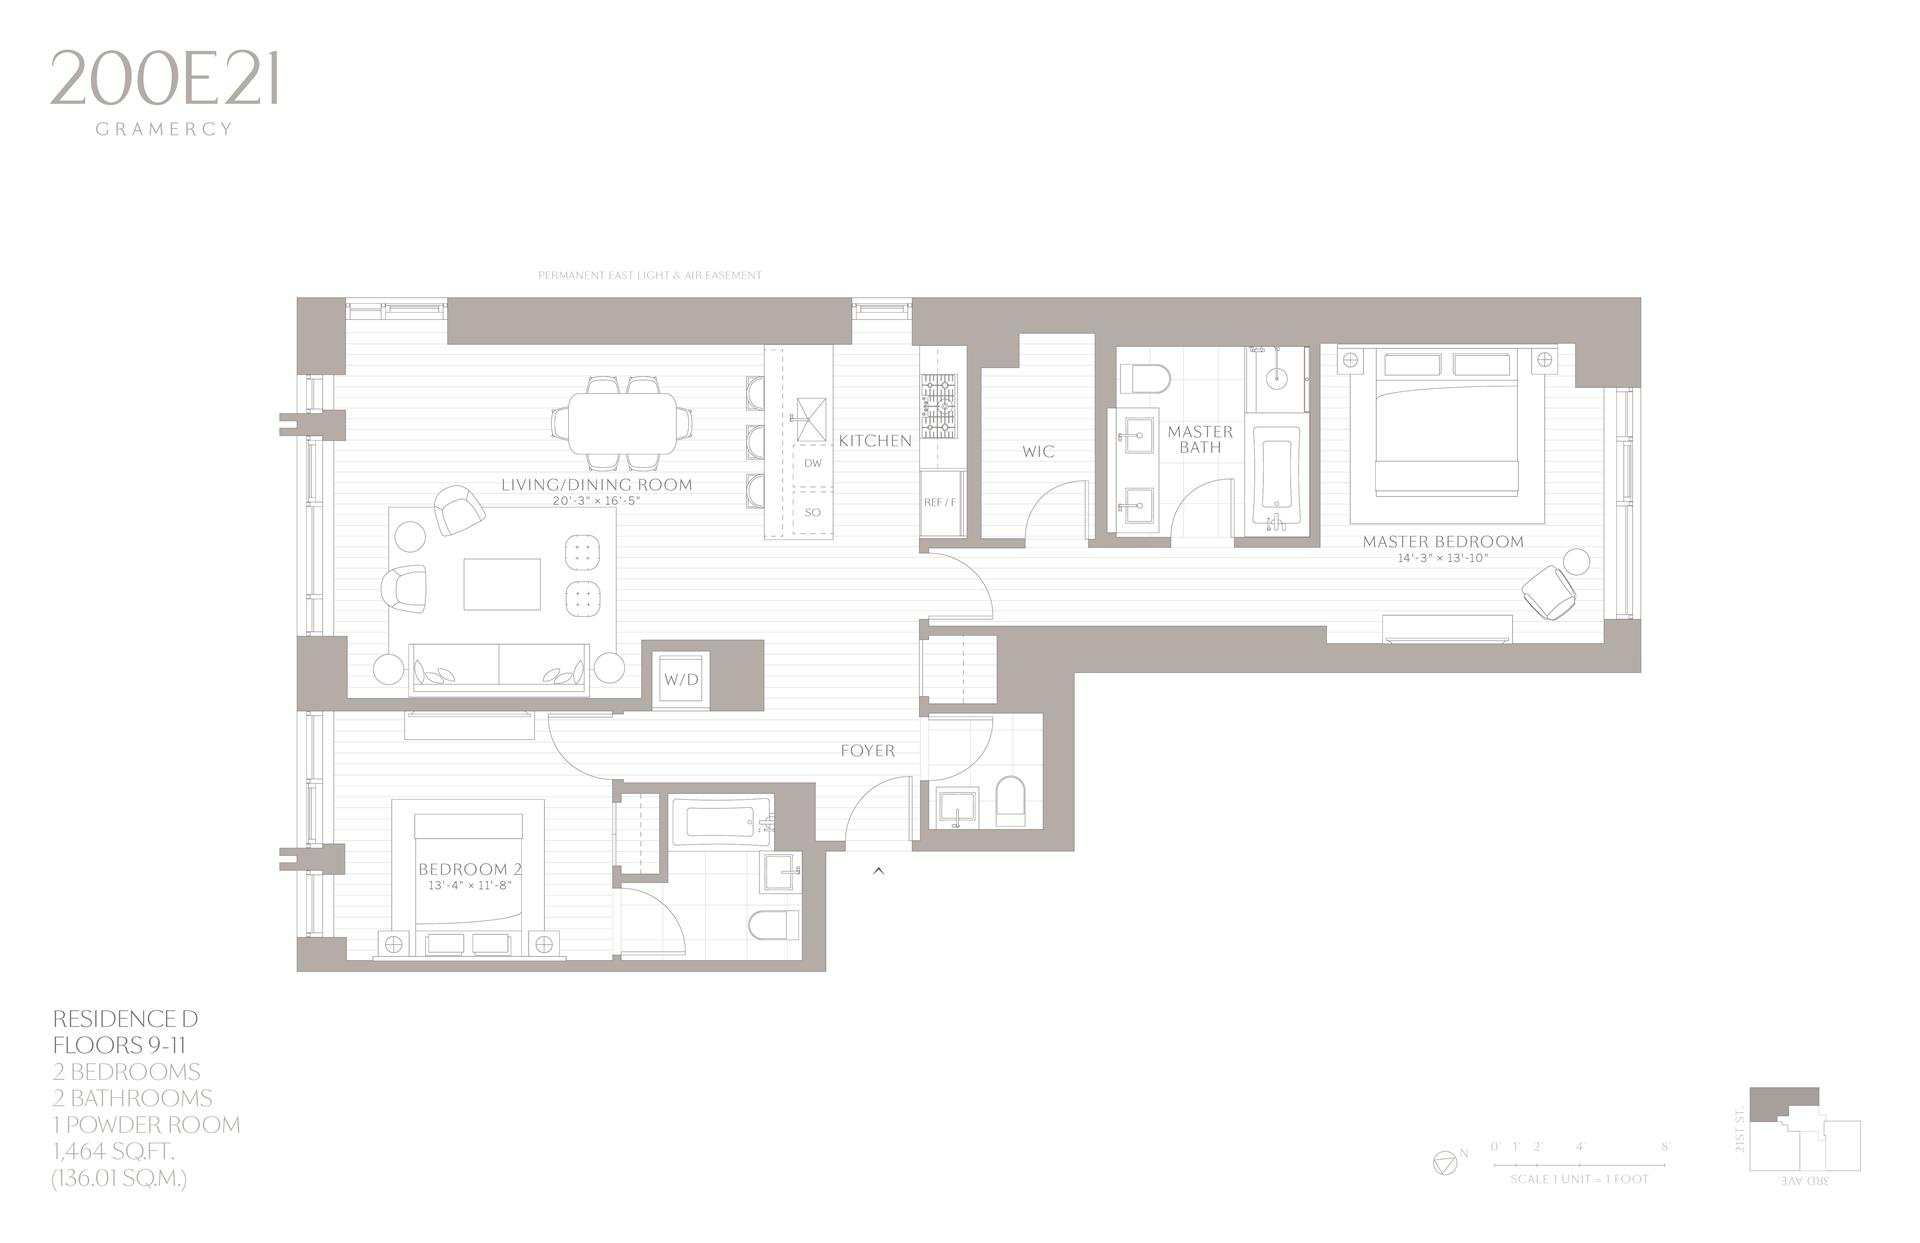 Floor plan of 200 East 21st Street, 11D - Gramercy - Union Square, New York